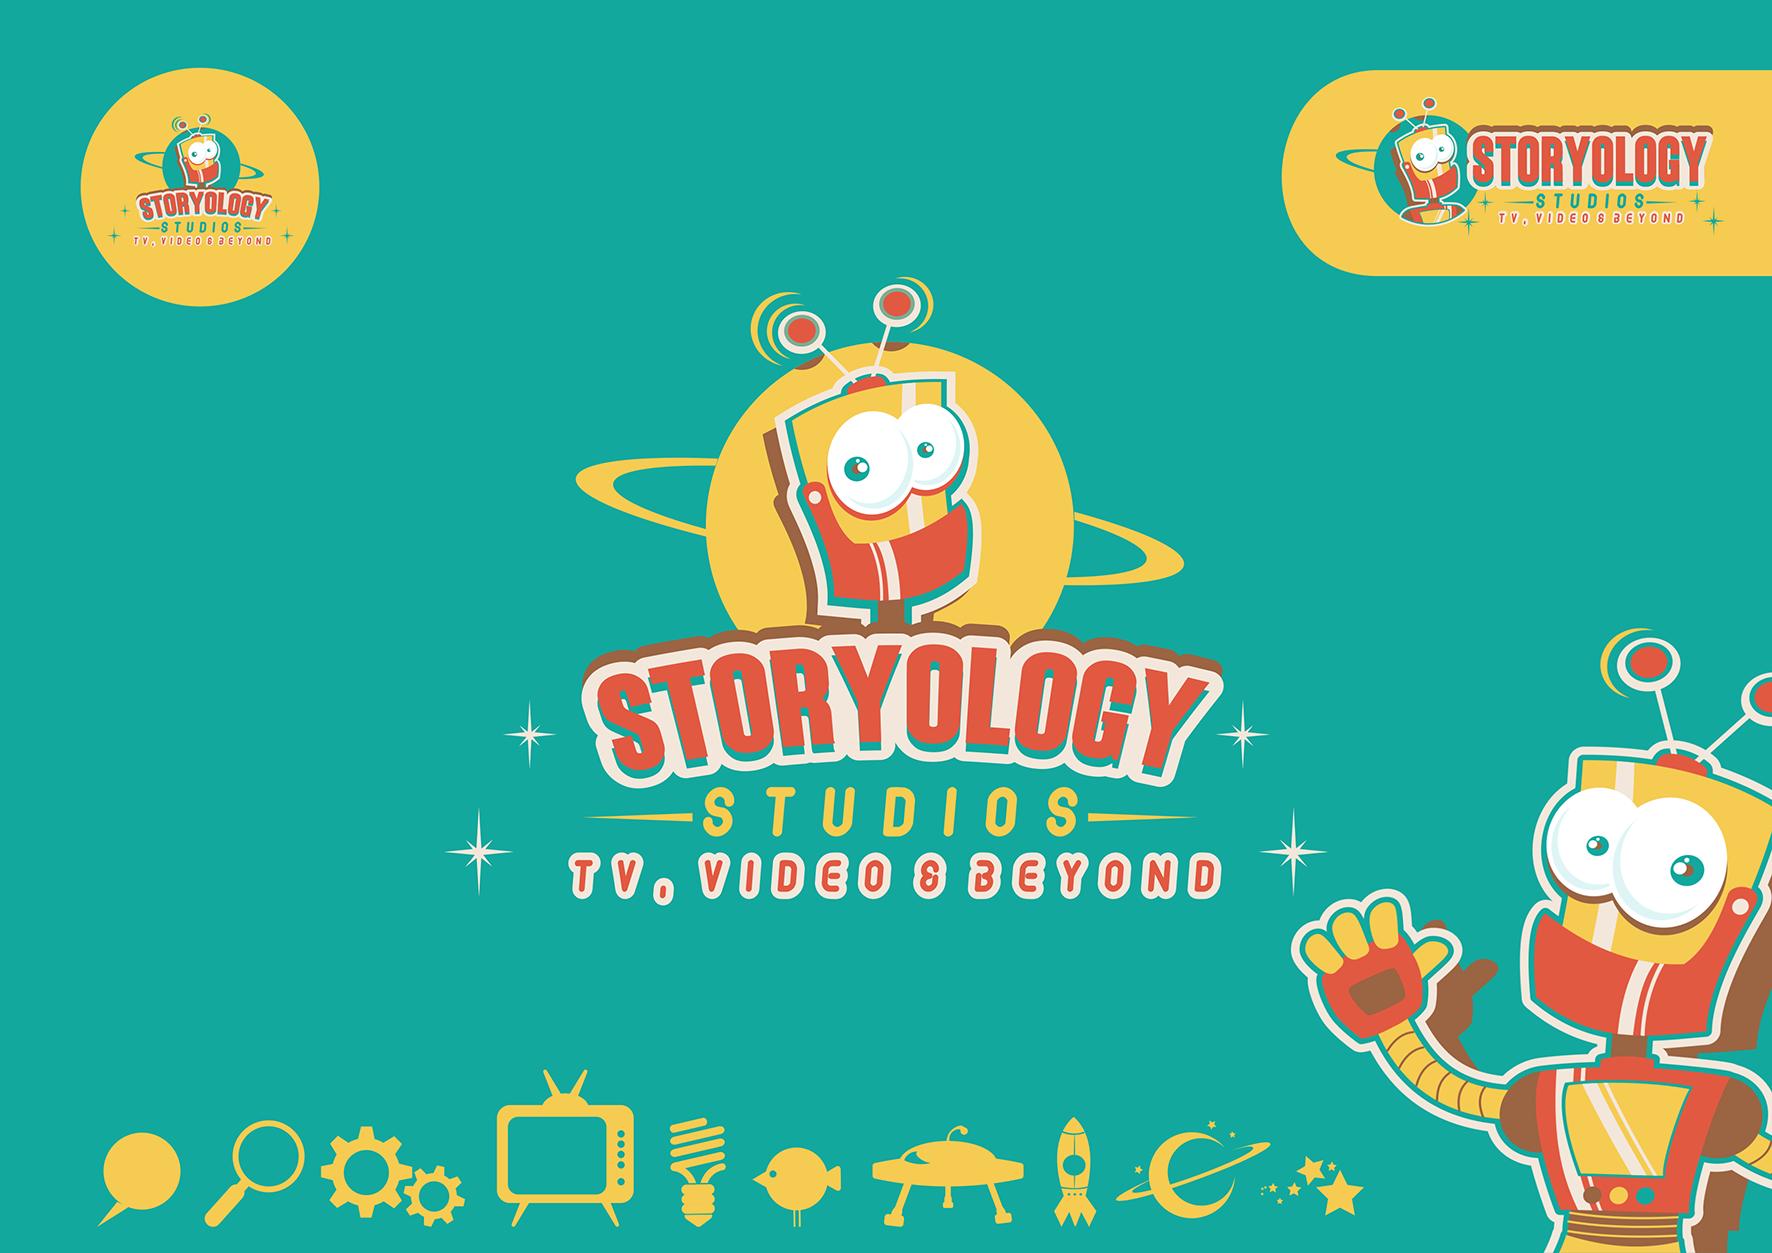 Create a Retro Sci Fi logo for Storyology Studios